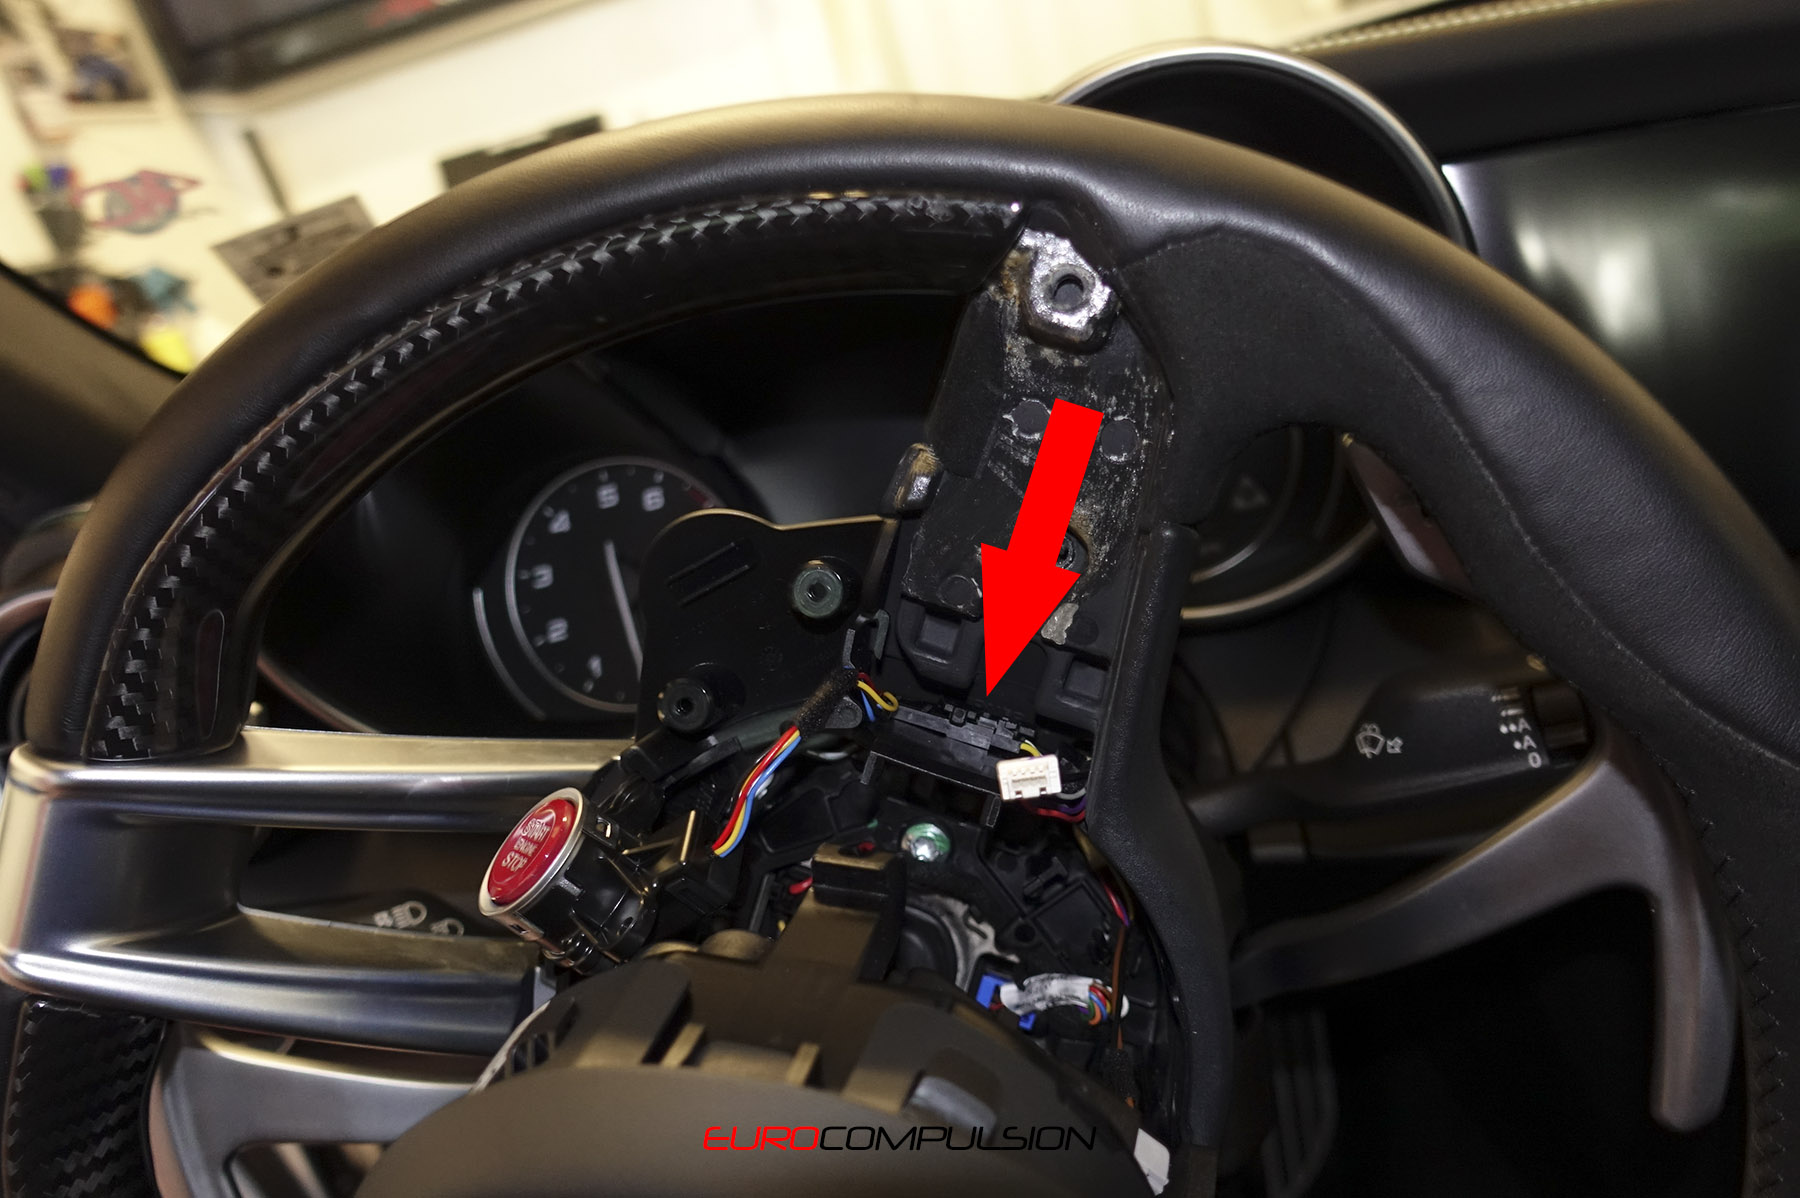 Alfa Romeo Ignition Starter Switch Wiring Diy Enthusiasts Start Diagram Giulia Stelvio Stop Rh Giuliaforums Com Pollak